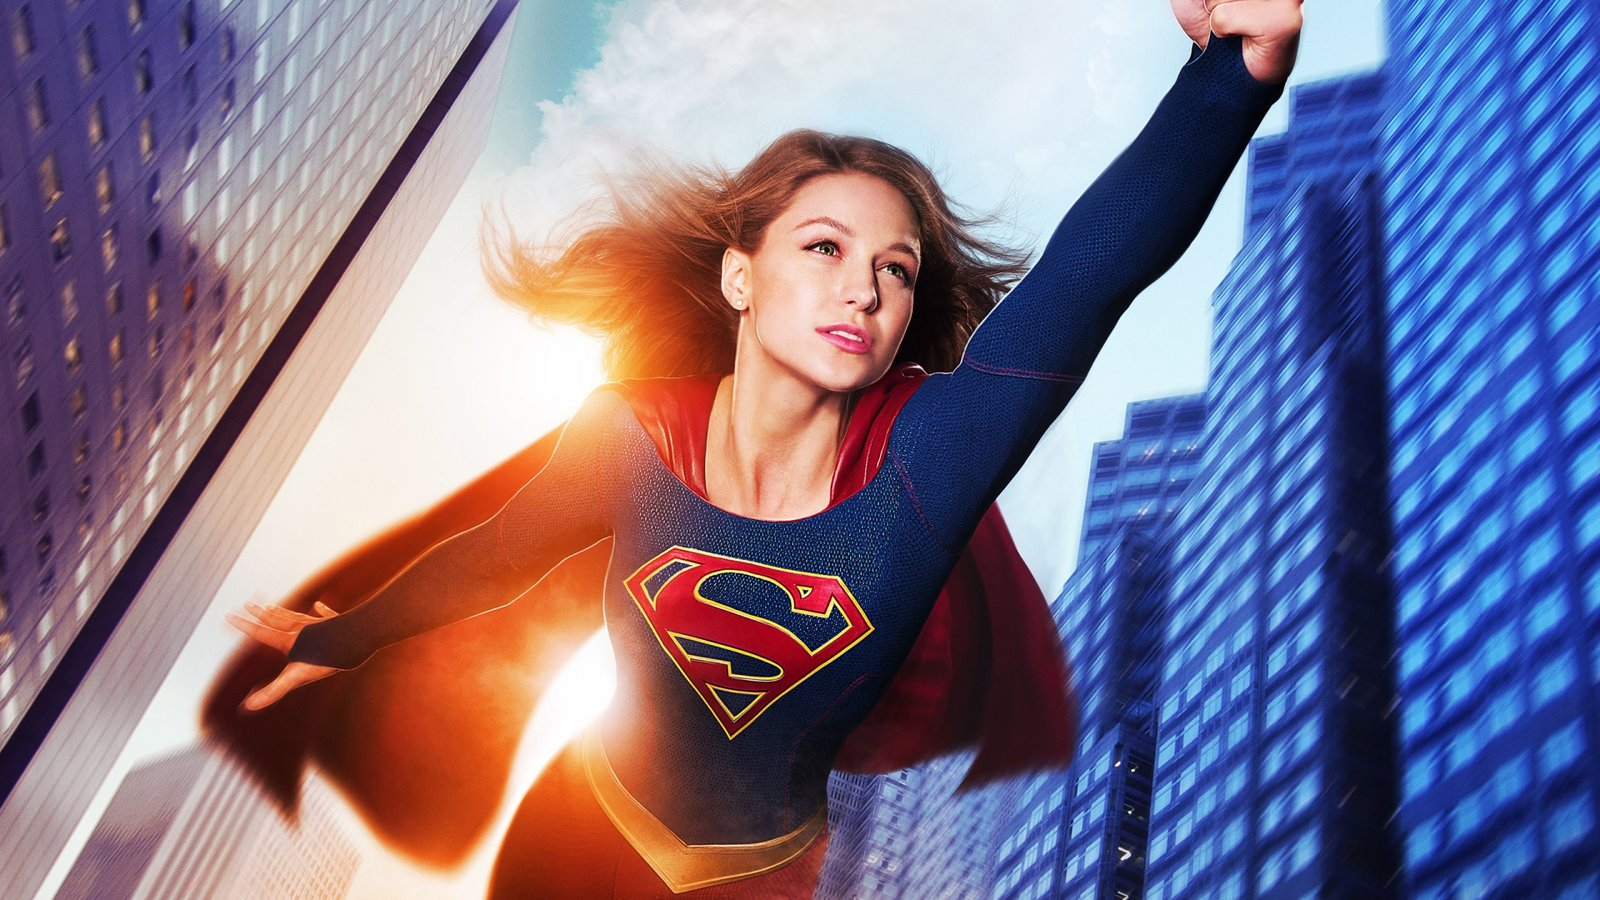 Супергёрл / Supergirl background